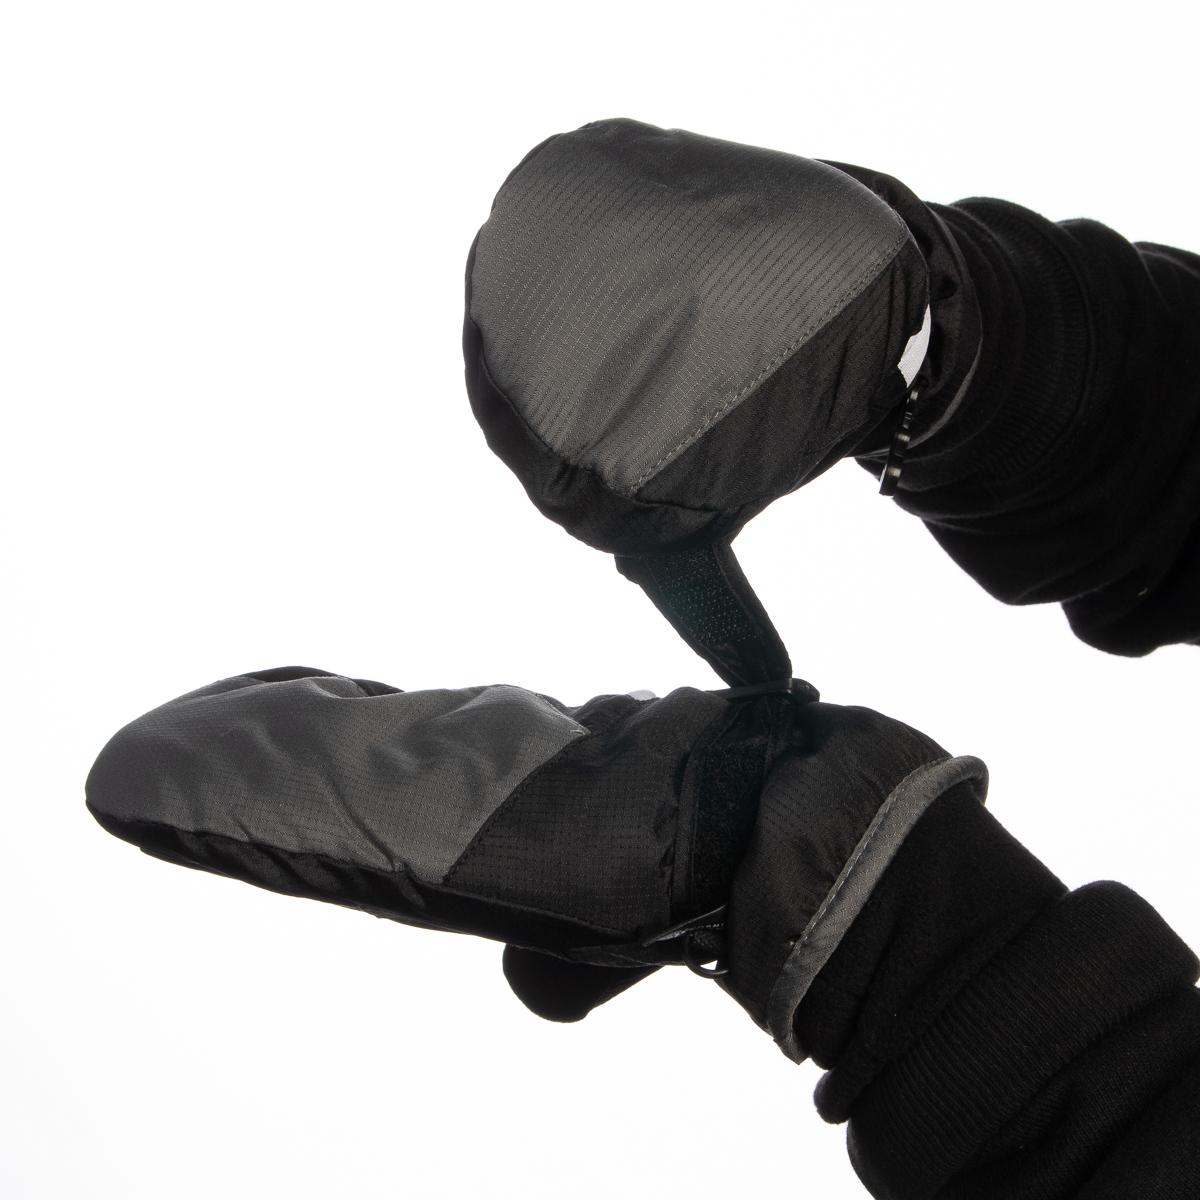 Statements-3M-Thinsulate-Boy-s-Cold-Weather-Winter-Warm-Fleece-Lined-Ski-Mittens